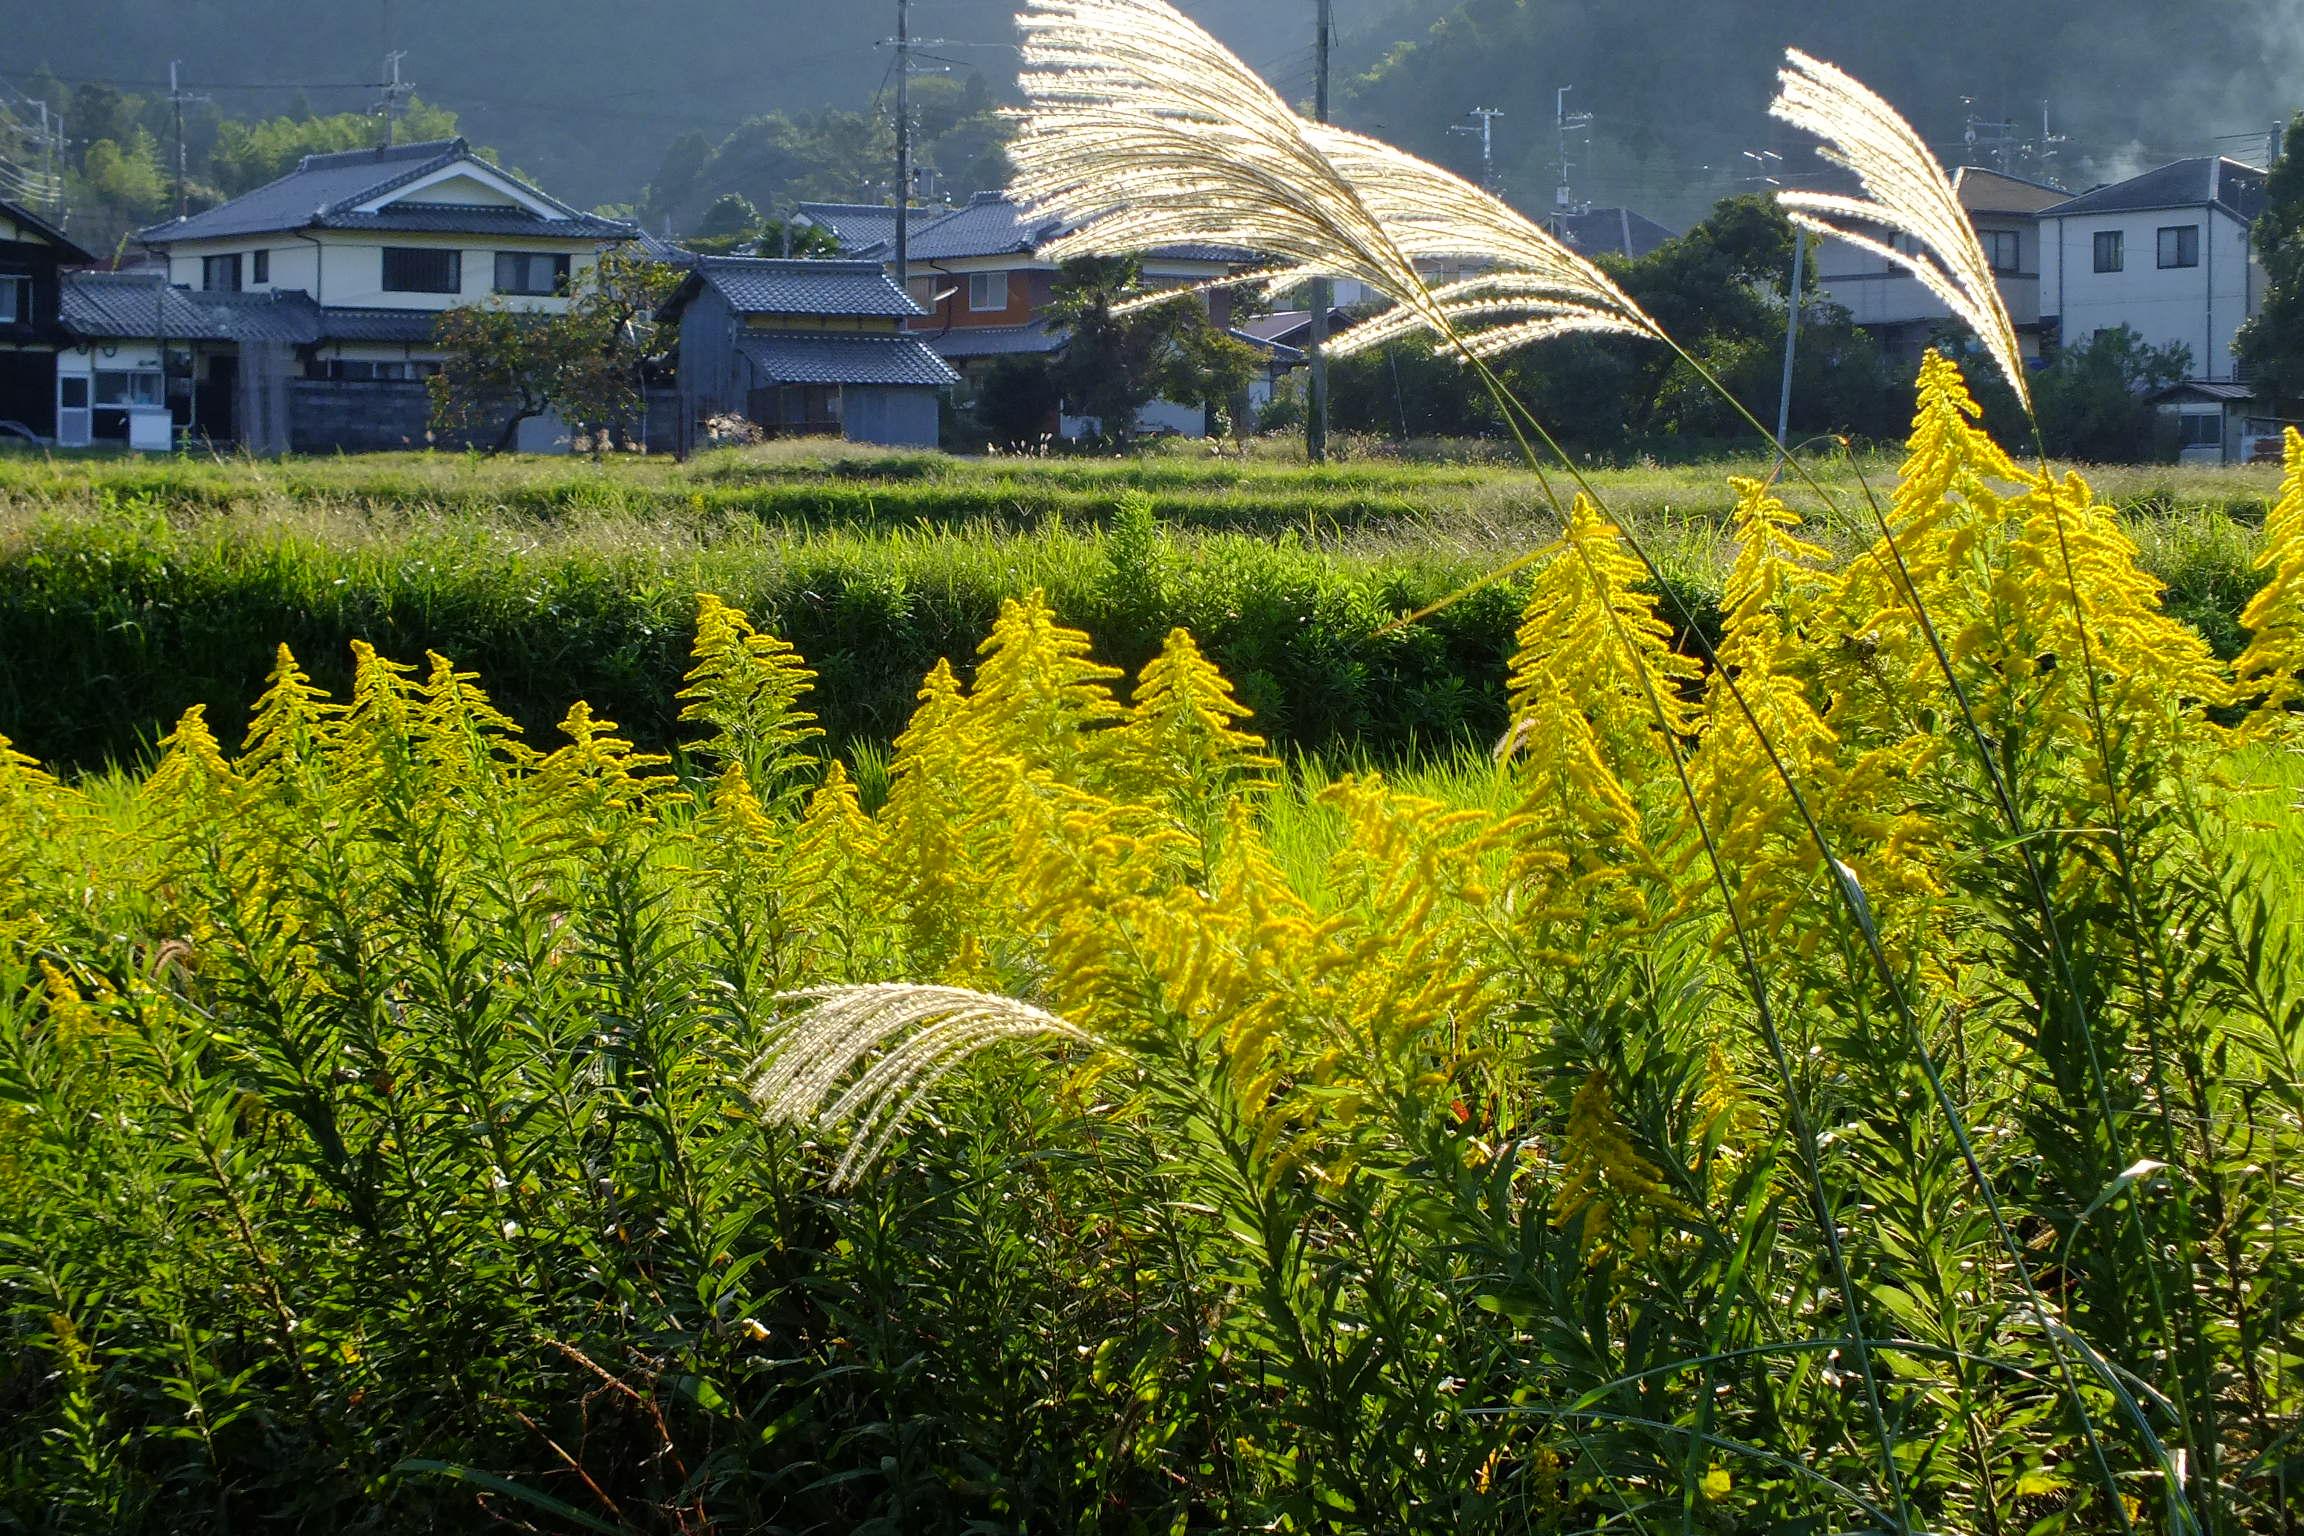 2016-10-15 Solidago canadensis,IN Sasayama,Hyogo セイタカアワダチソウ(篠山市) DSCF1299.jpg